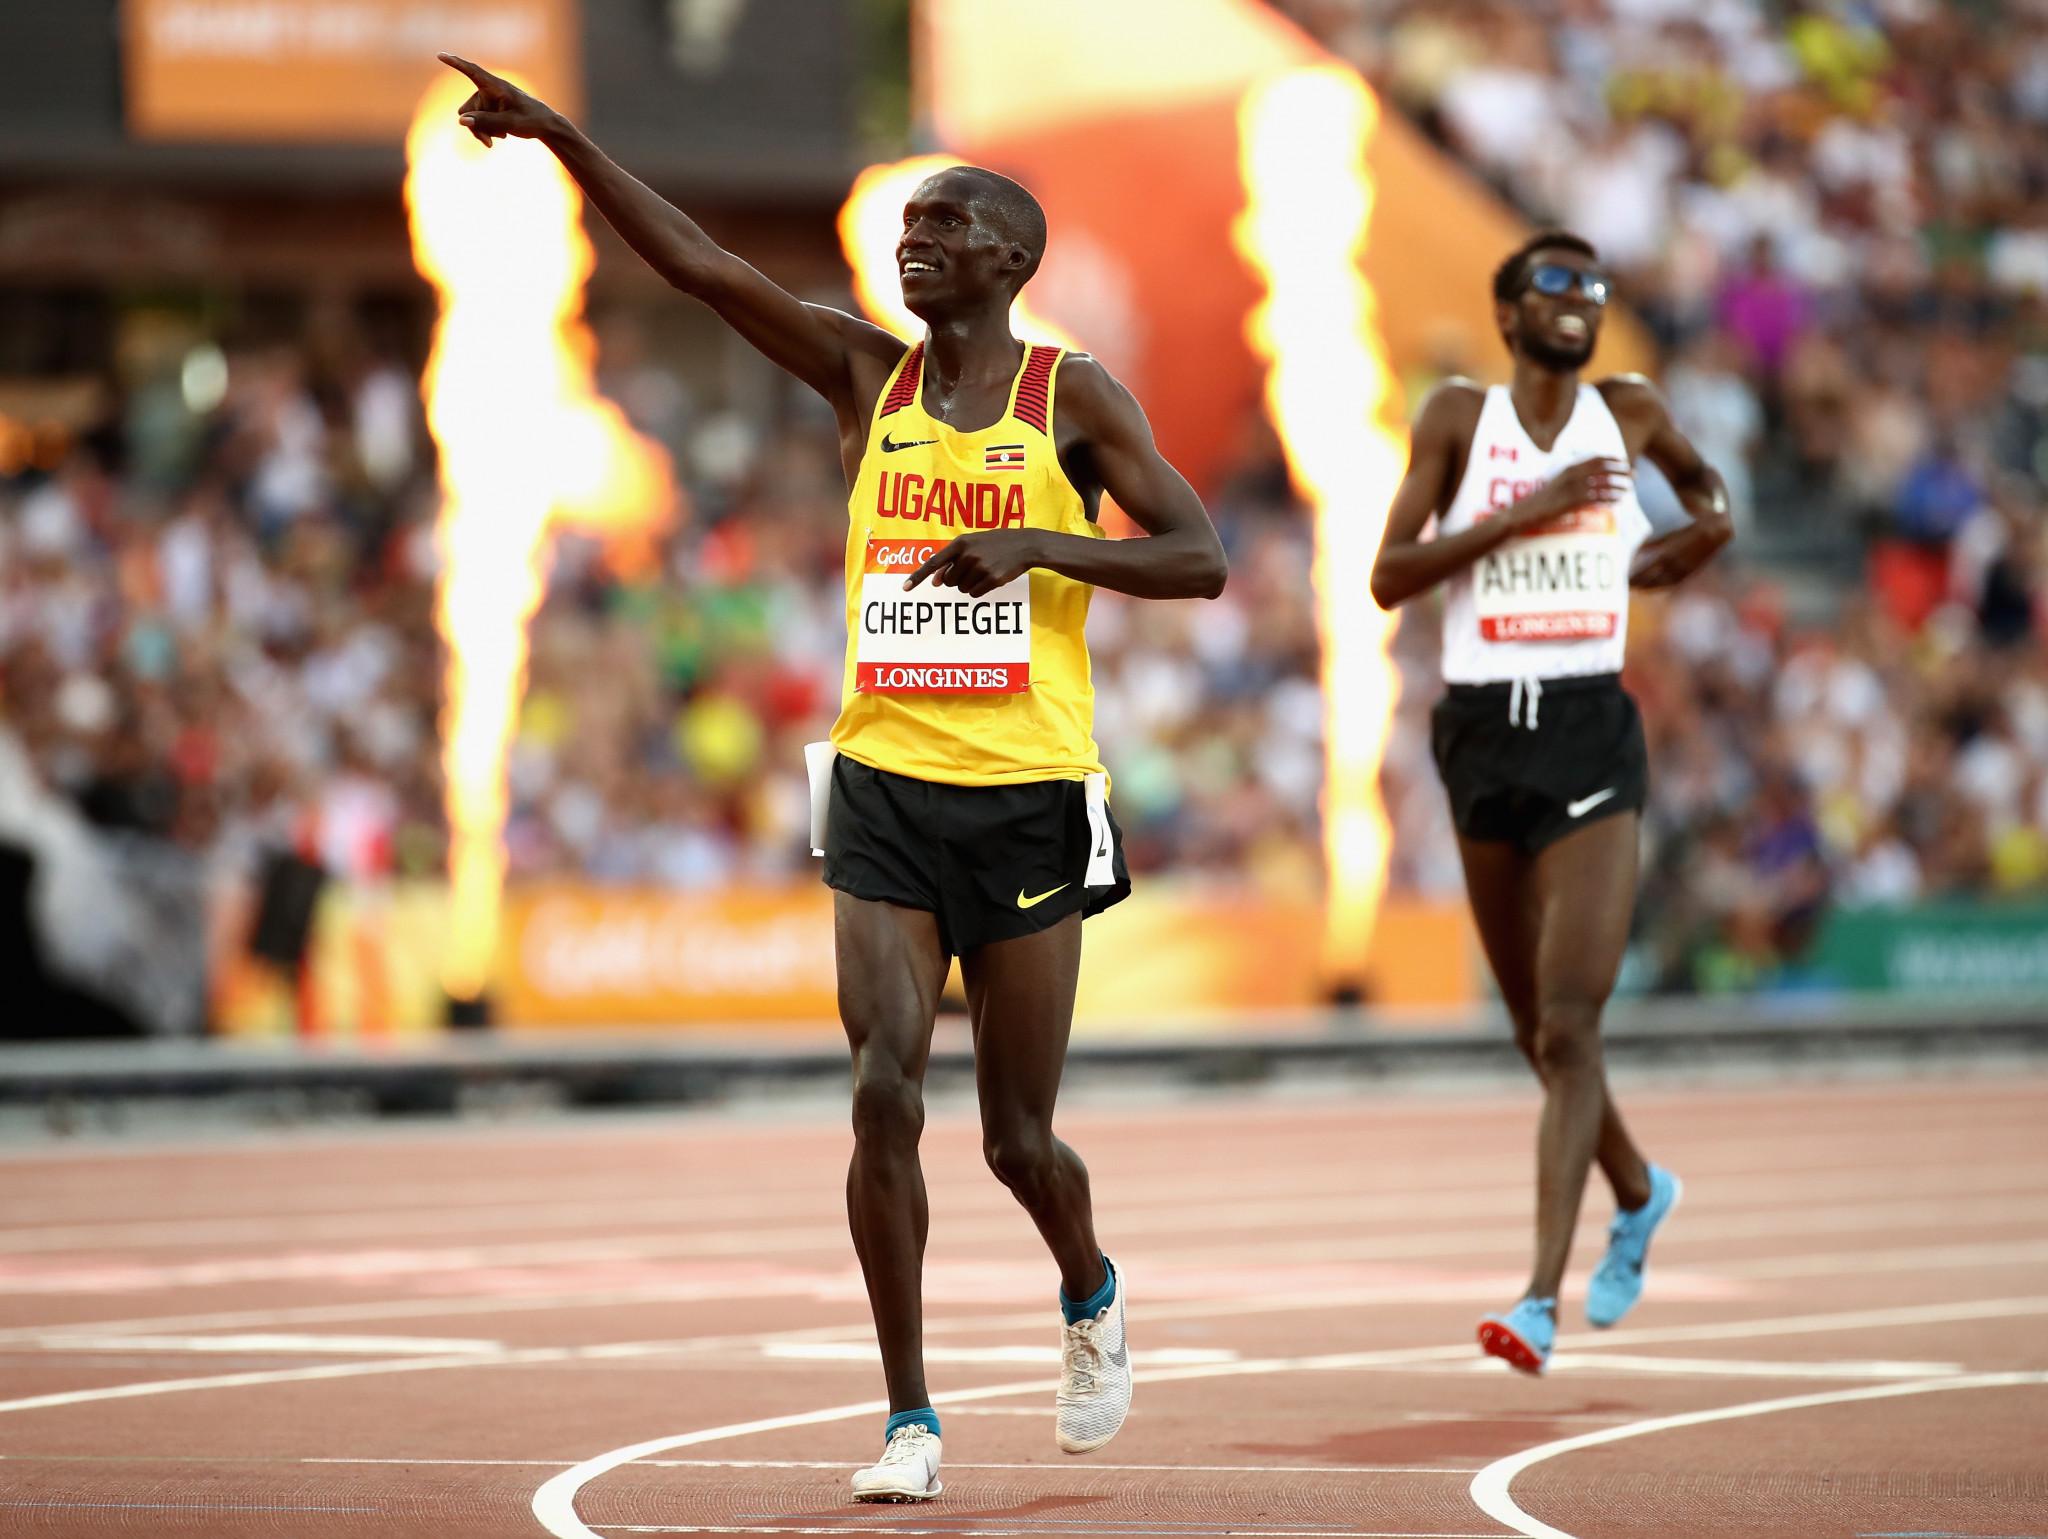 Uganda's Joshua Cheptegei wins 2018 Commonwealth 5000m gold medal